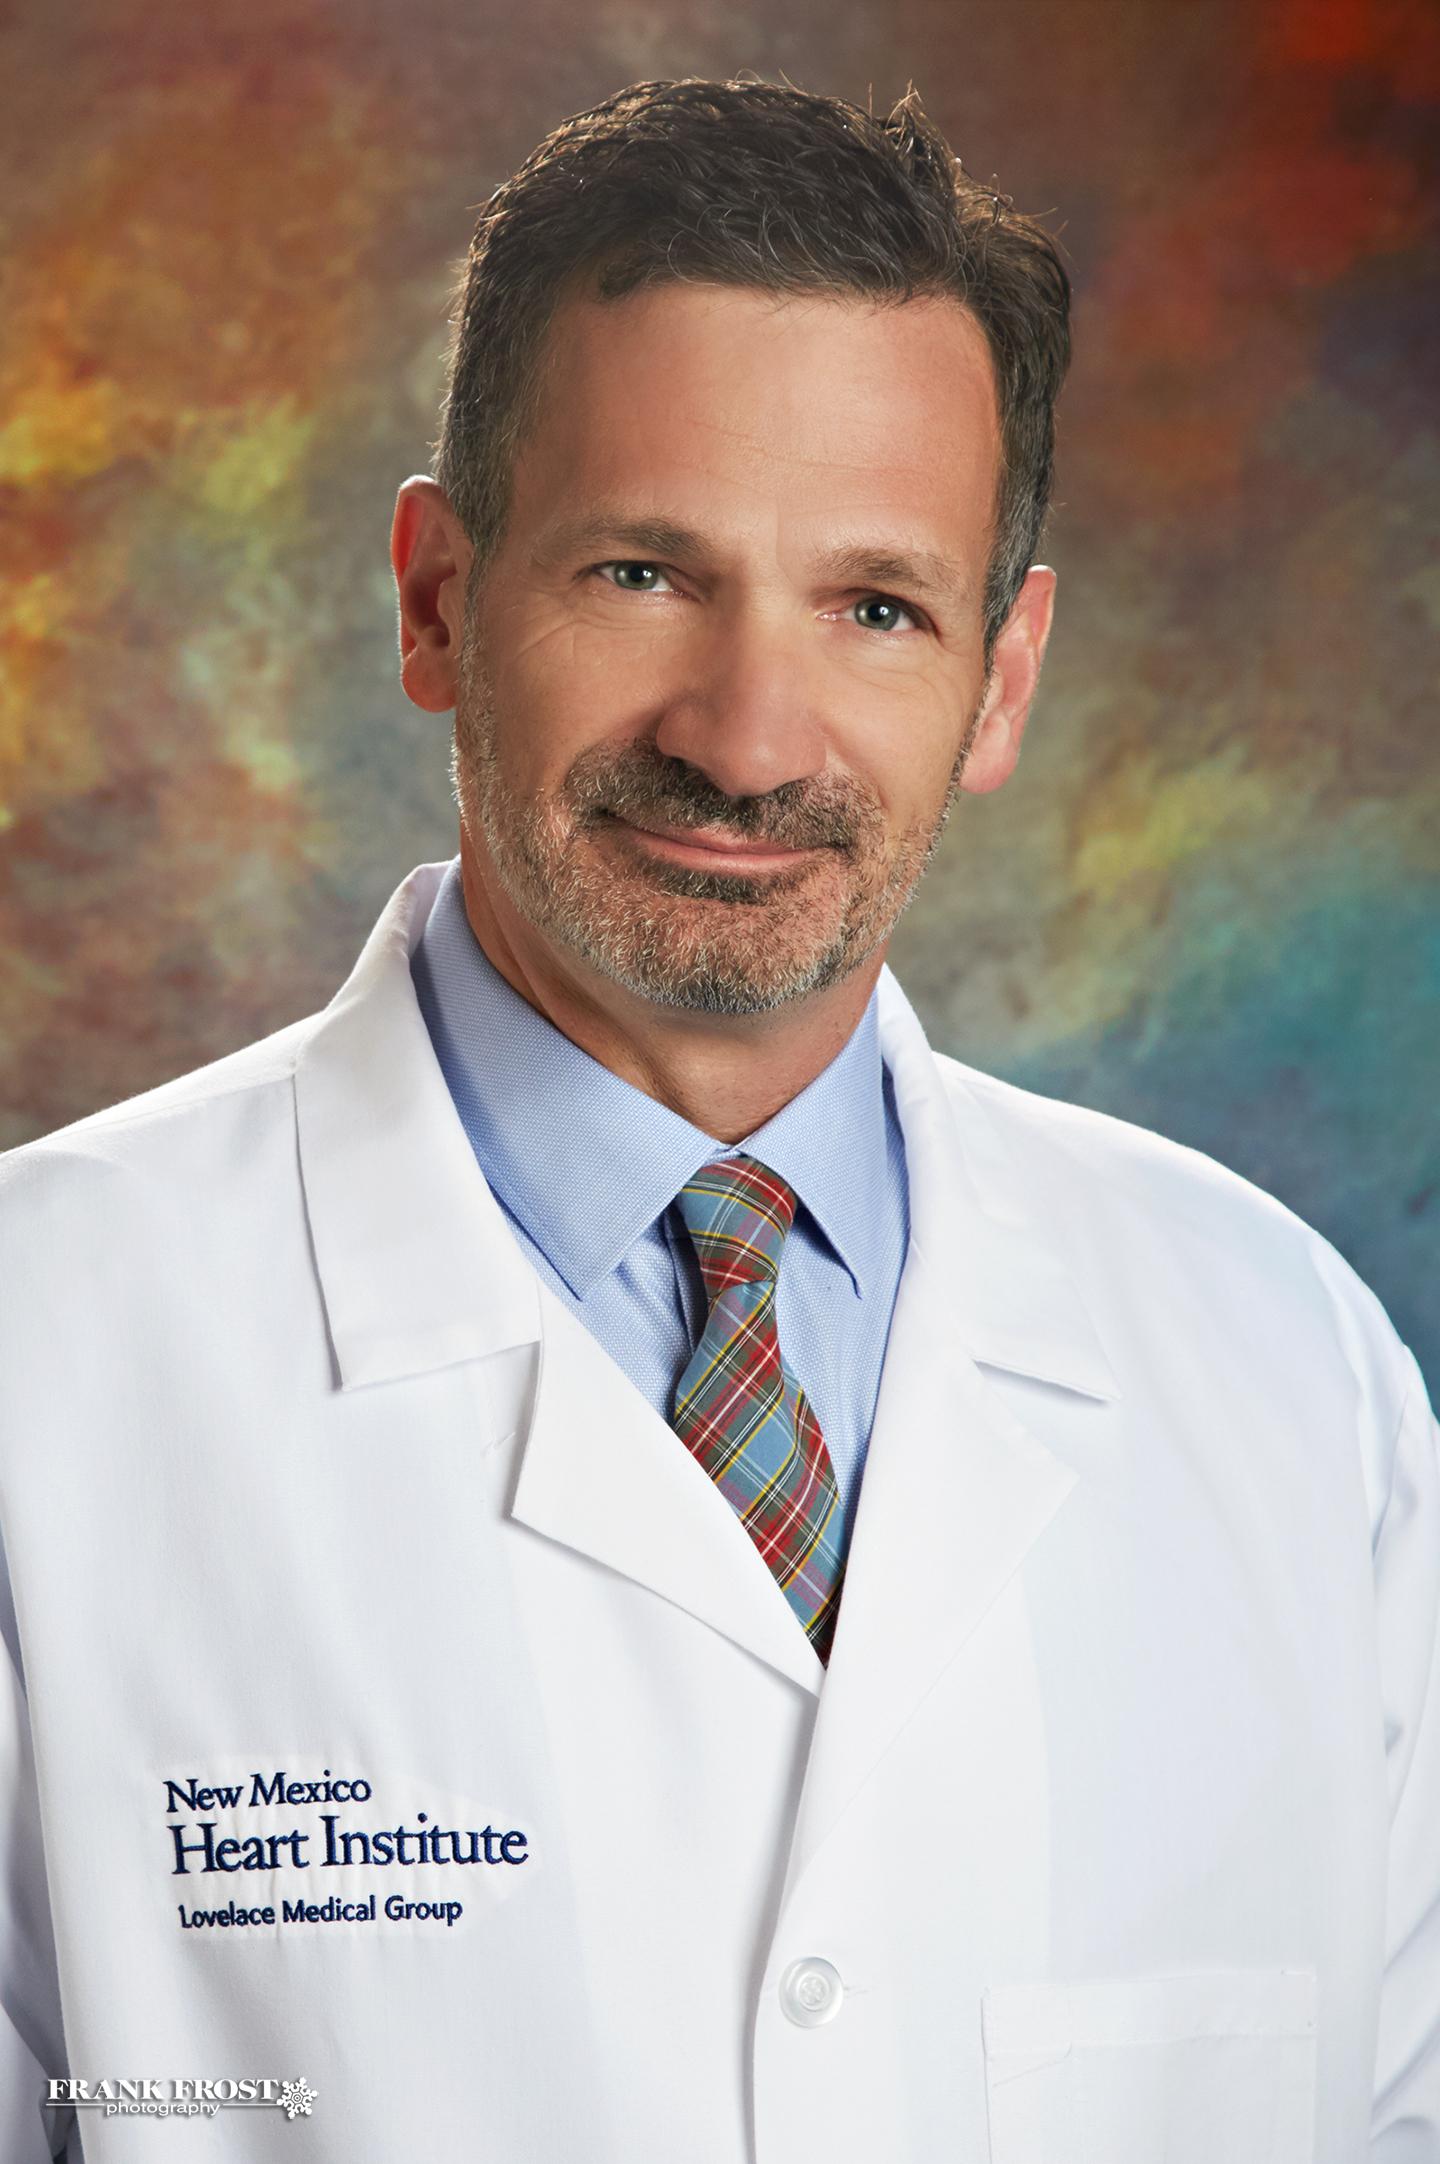 Geoffrey A. Kunz, M.D. FACC